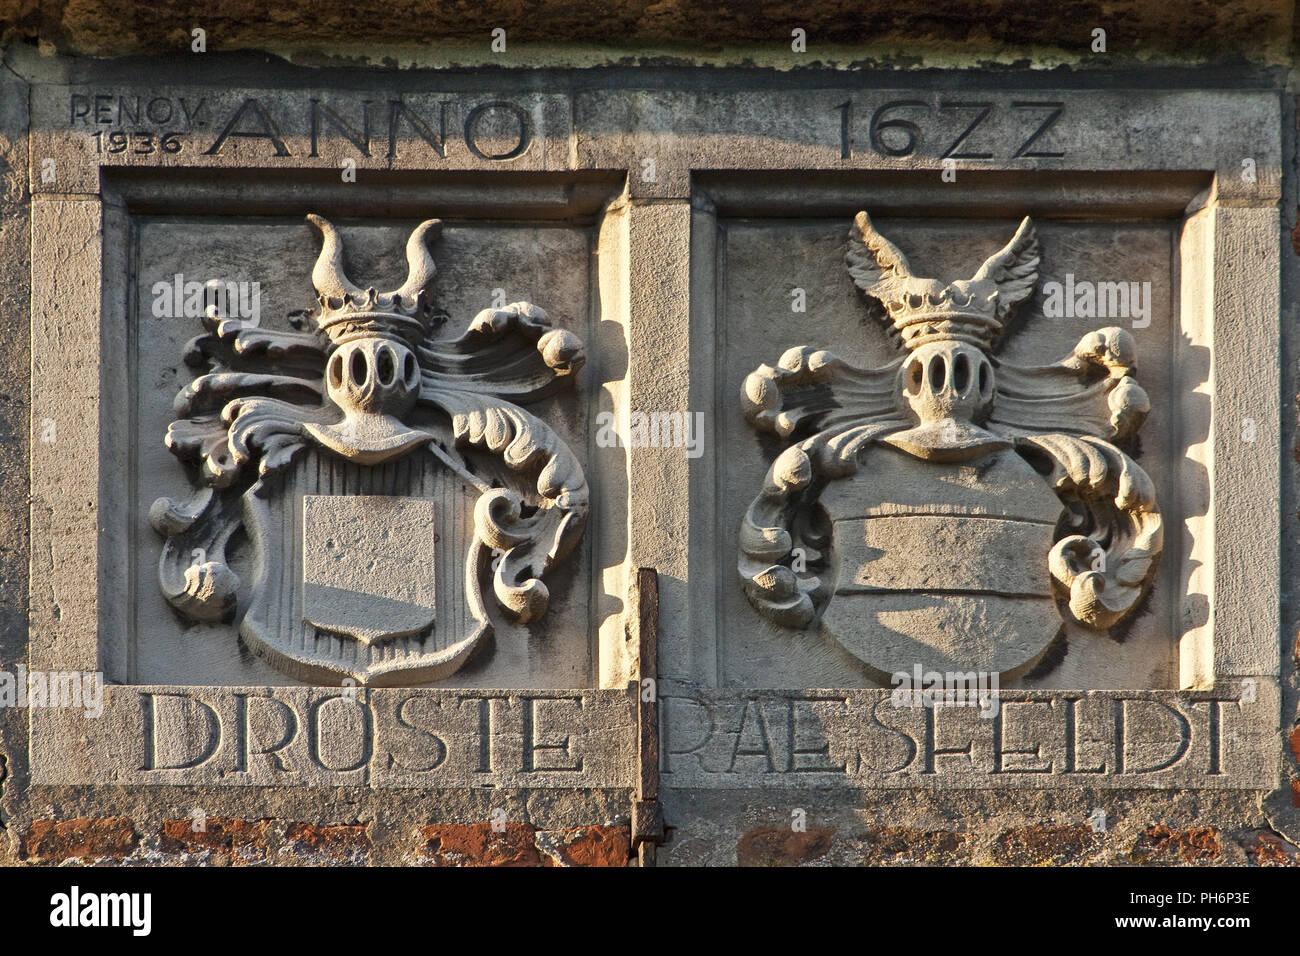 Detail, castle Vischering, Luedinghausen, Germany - Stock Image